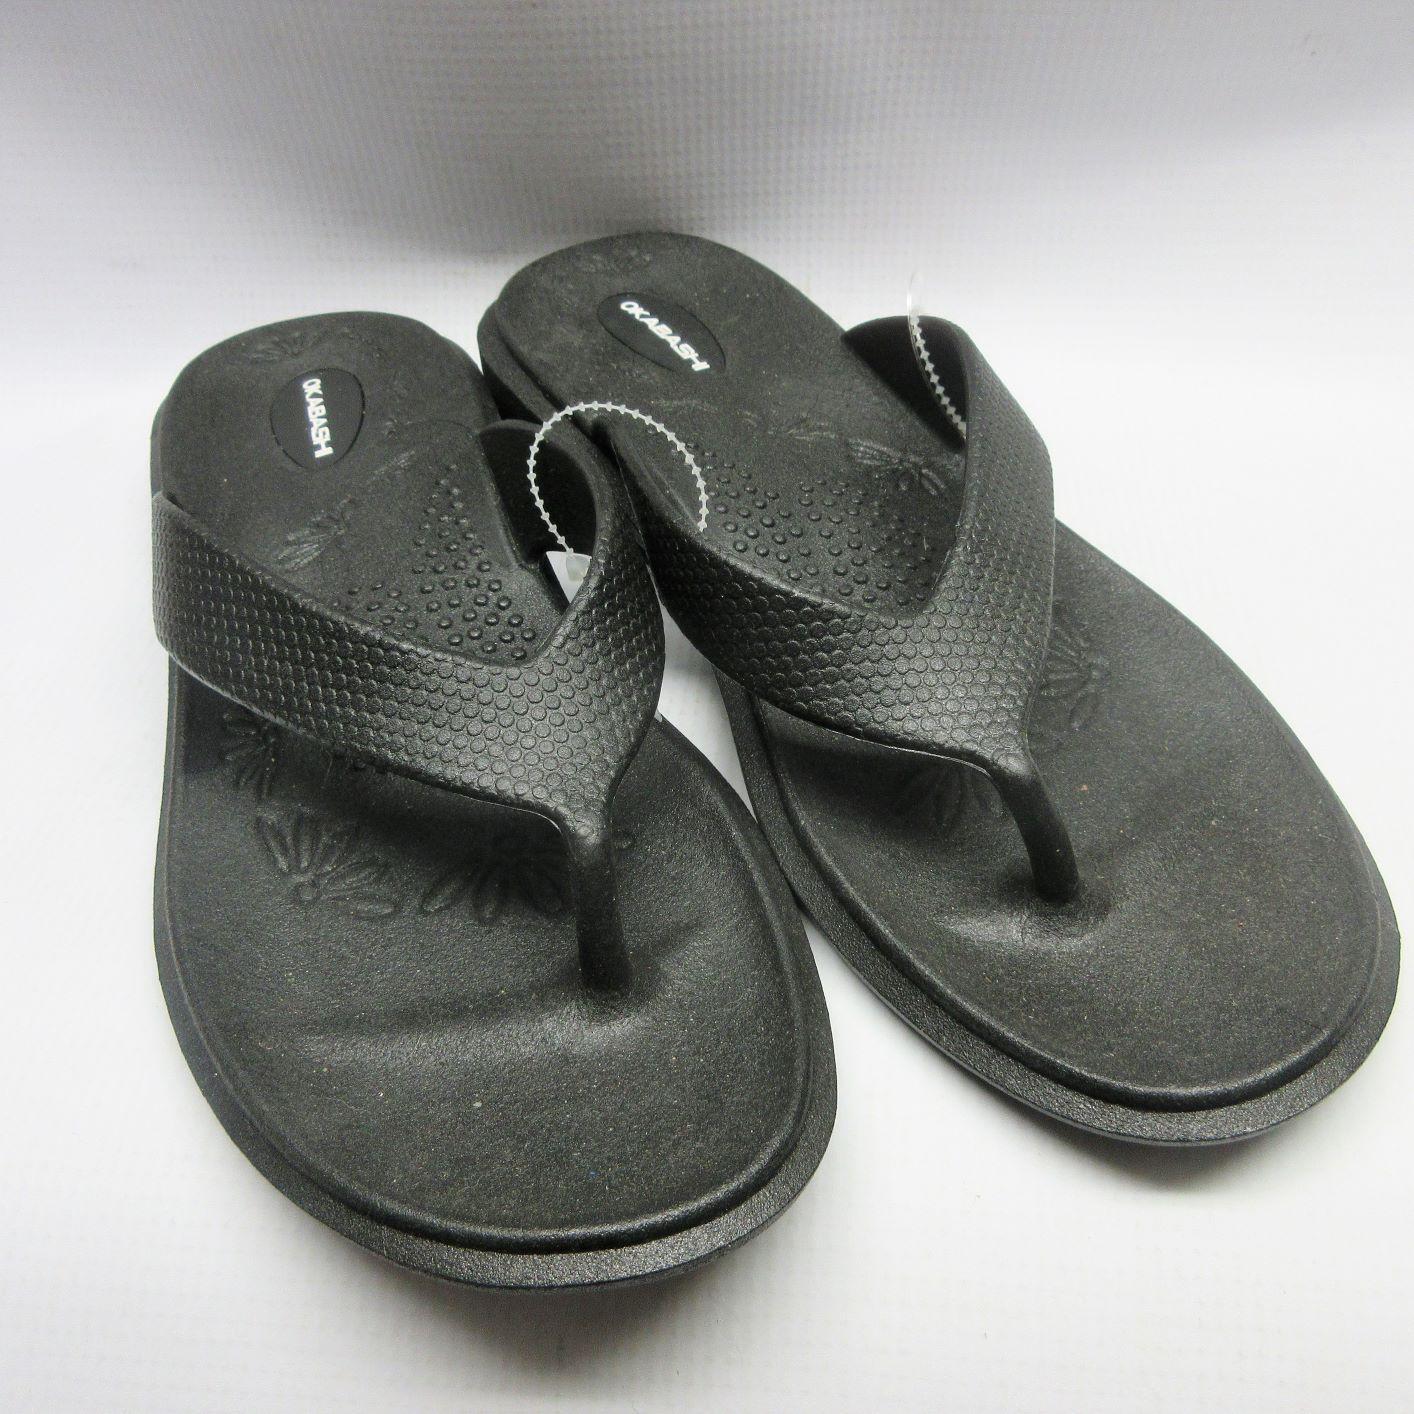 e676c31c17287 Okabashi Sandals Women Maui Flip Flops in Black — Cabaline